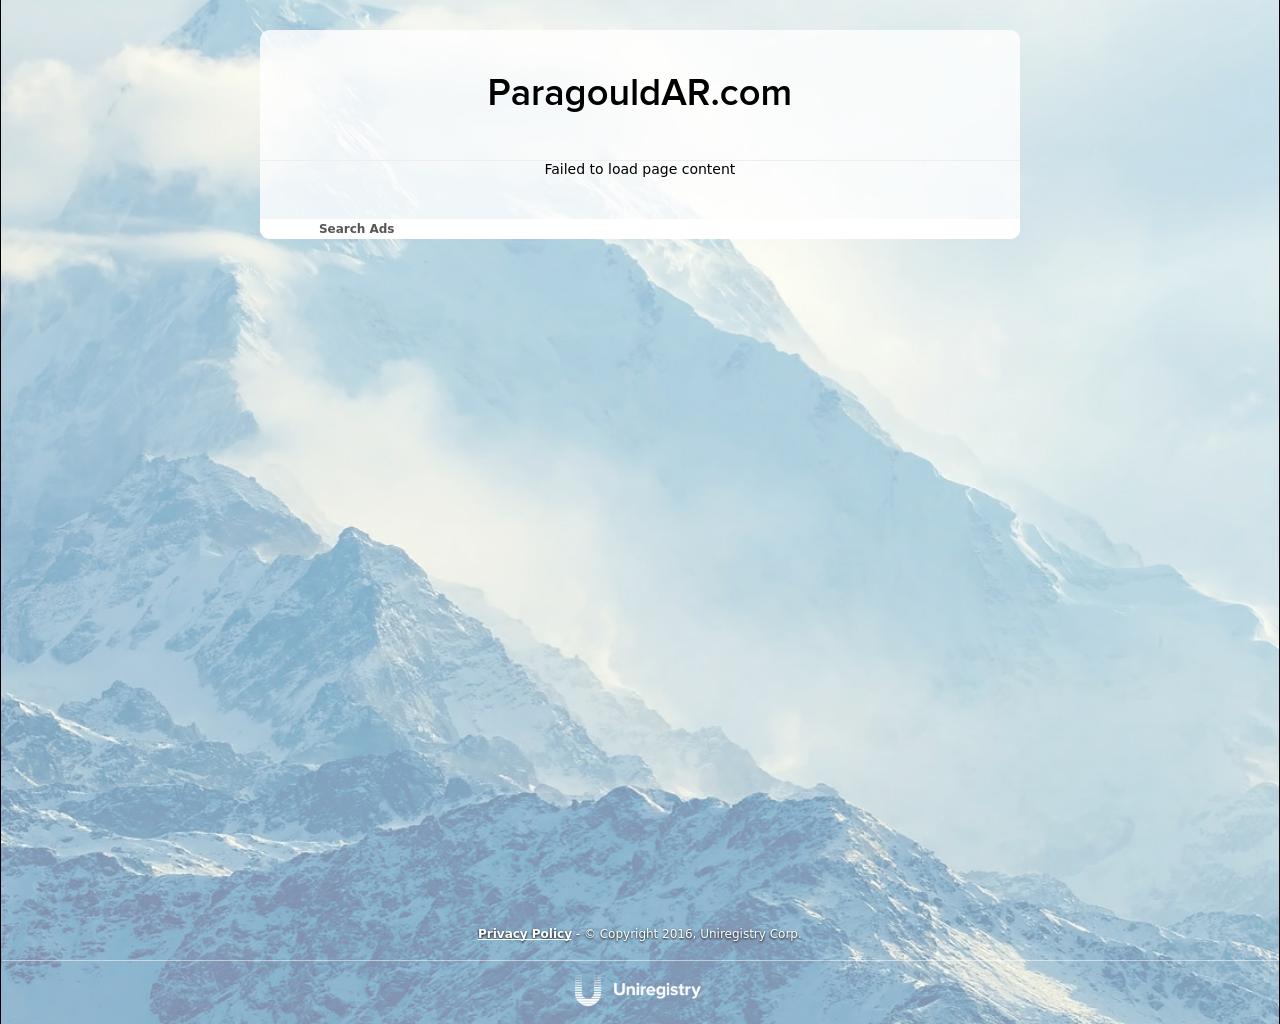 ParagouldAR.com-Advertising-Reviews-Pricing